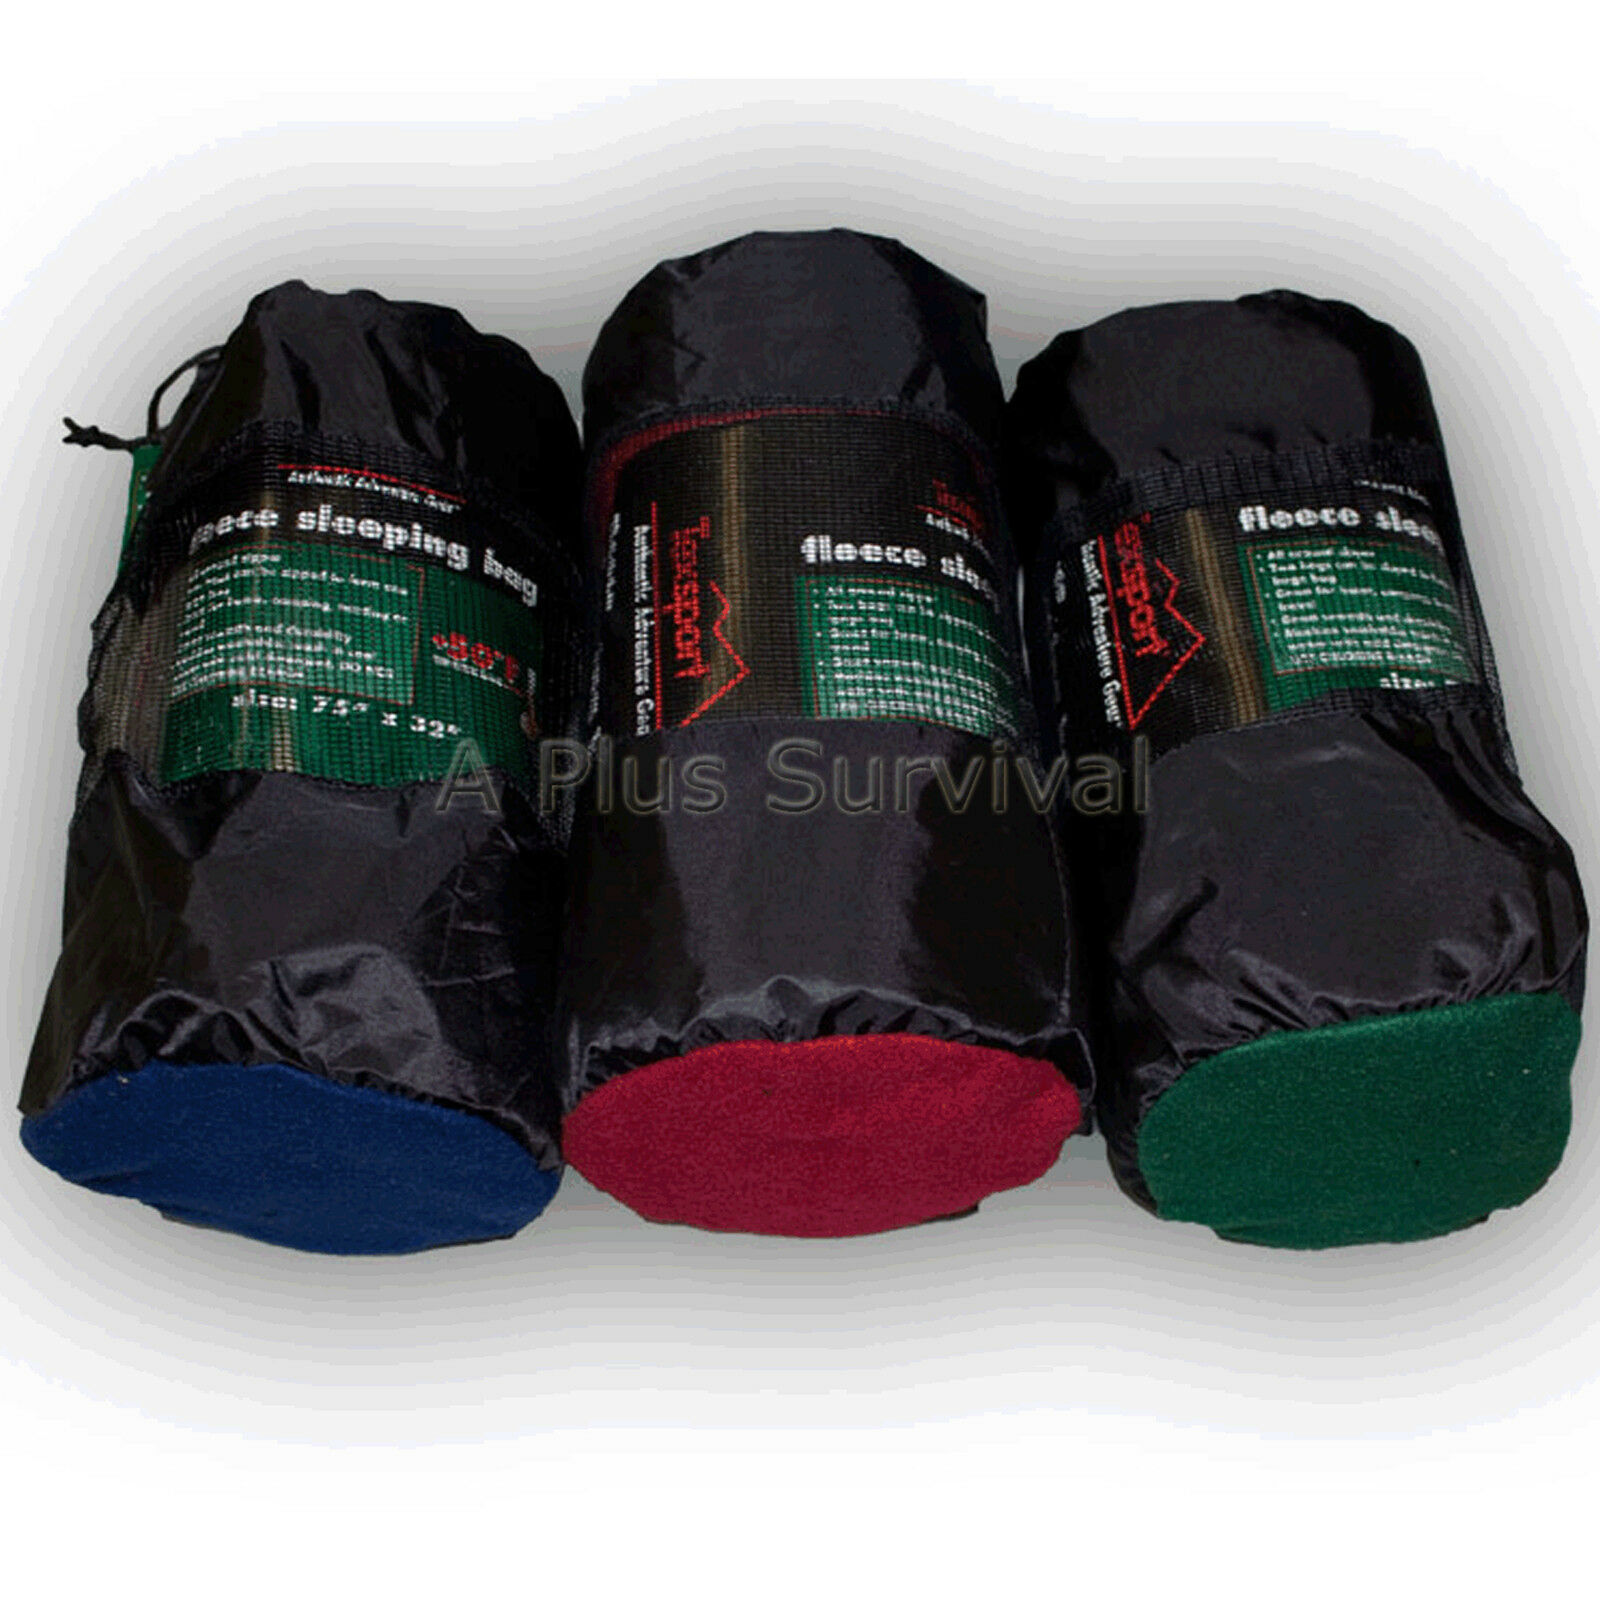 Lot of 4 - Fleece Sleeping Bag - 50 Degree - Emergency Survival Kit - 32  x 75